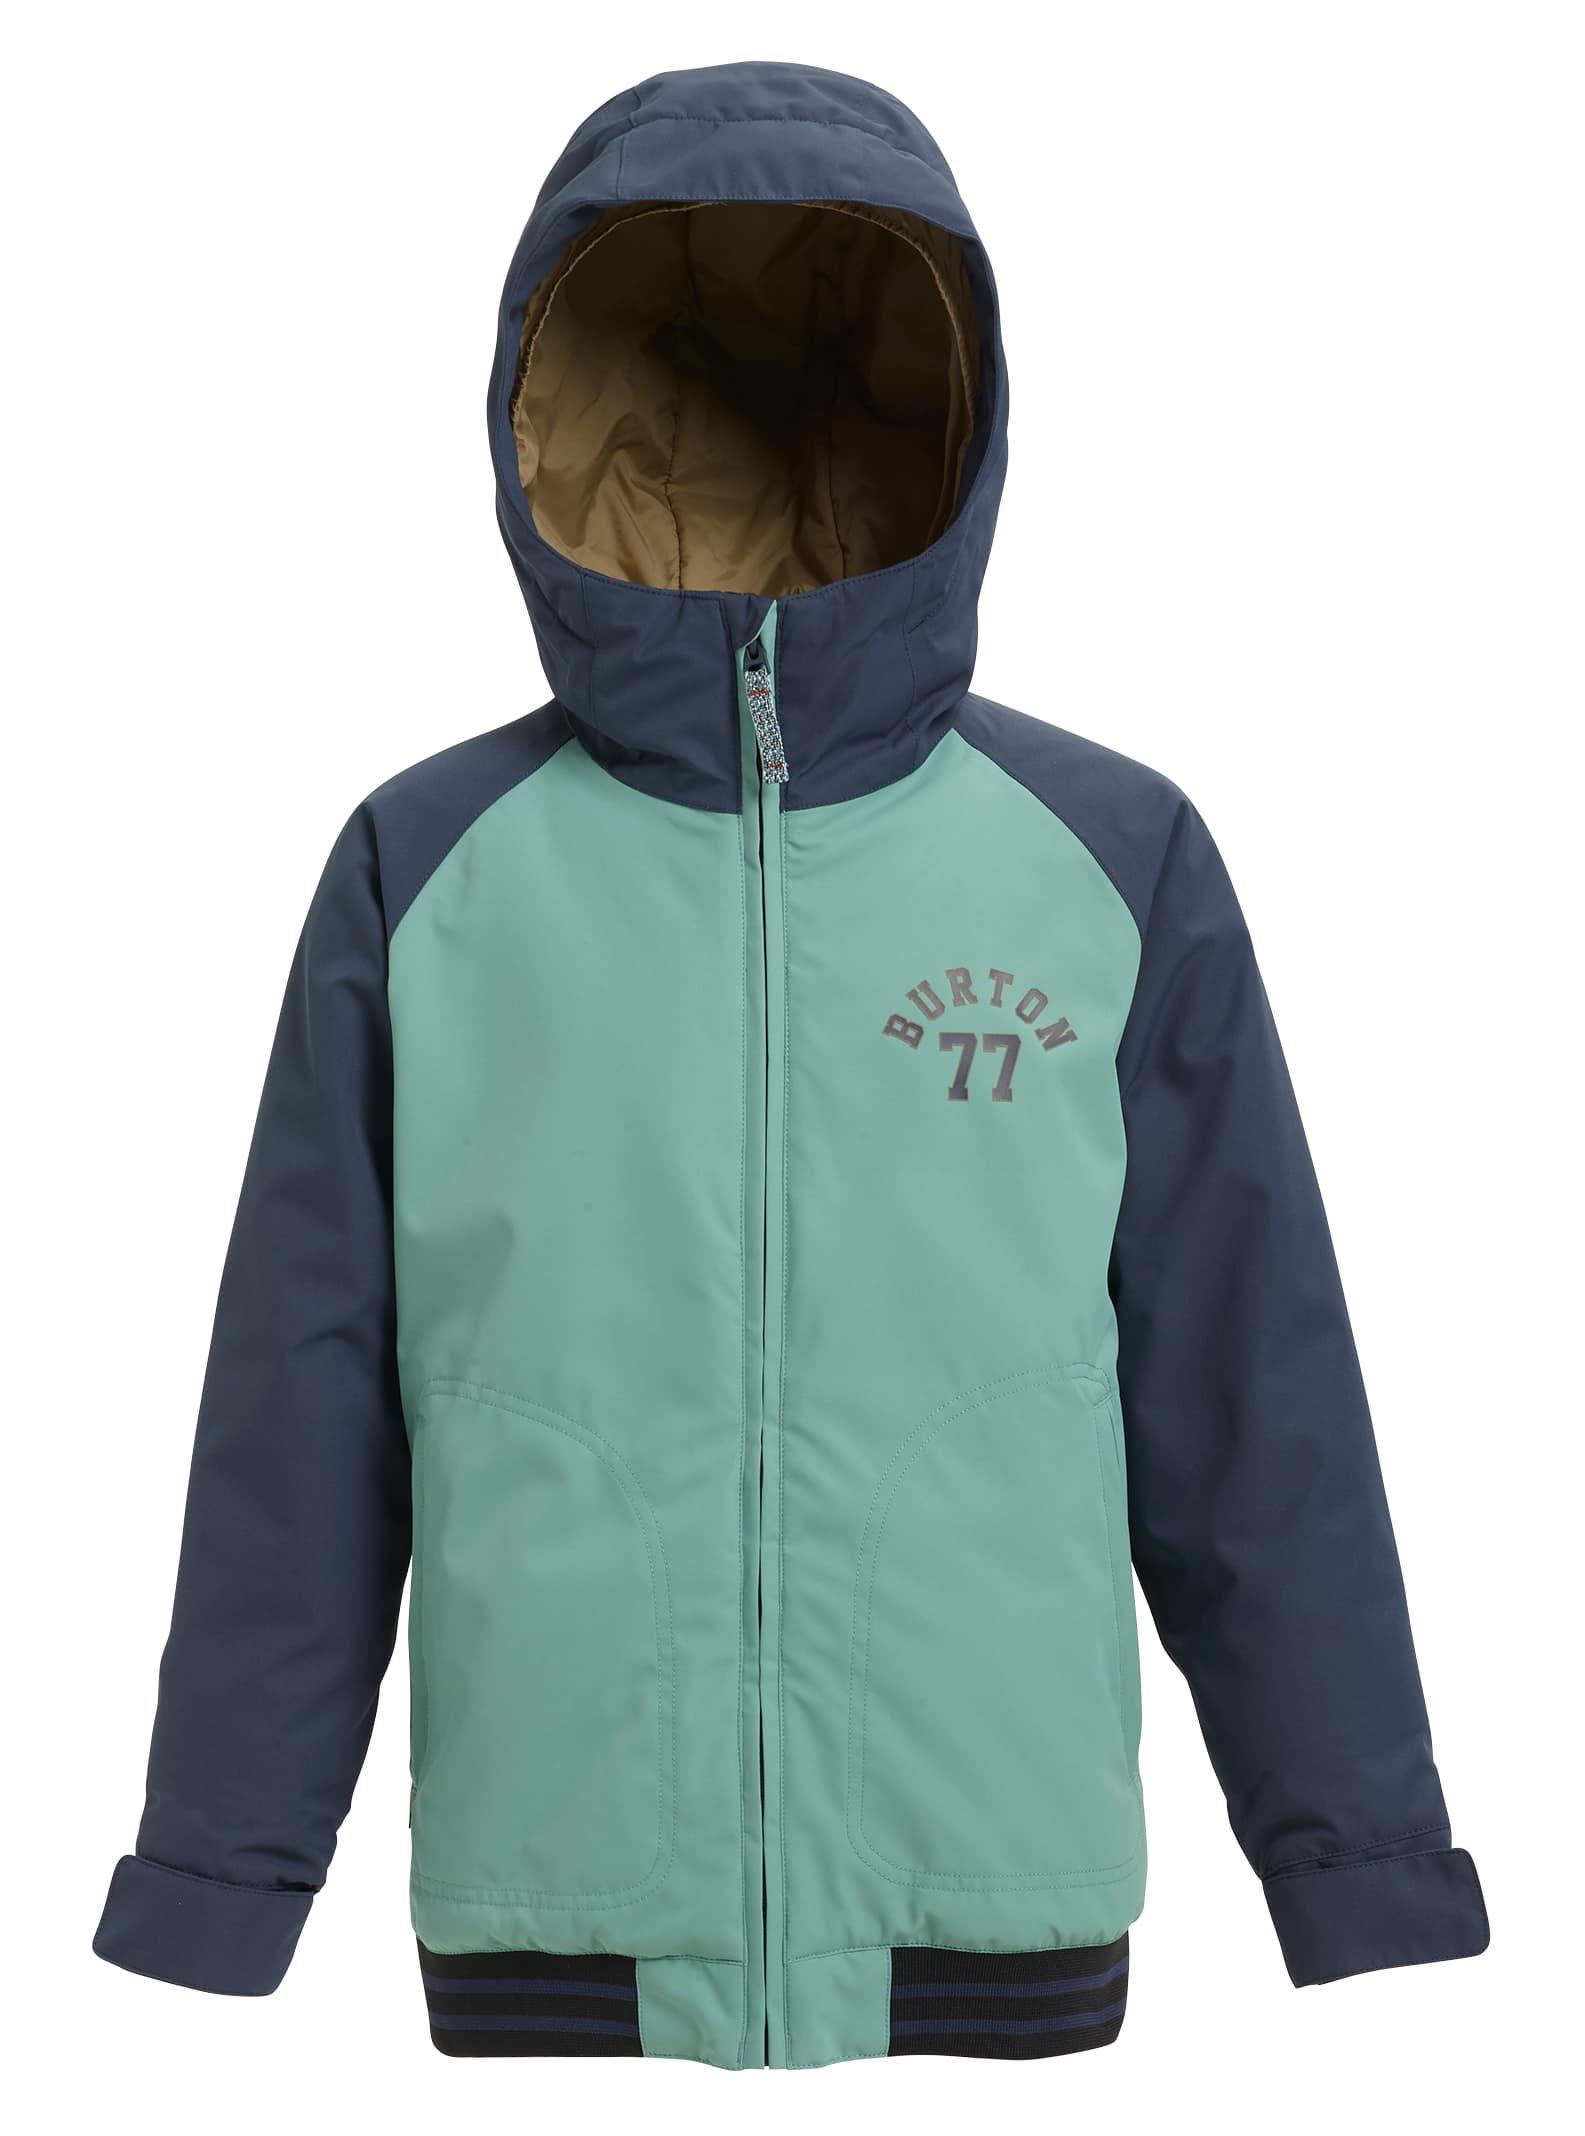 83713886b3708 Boys' Burton Game Day Jacket | Products | Jackets, Winter jackets ...